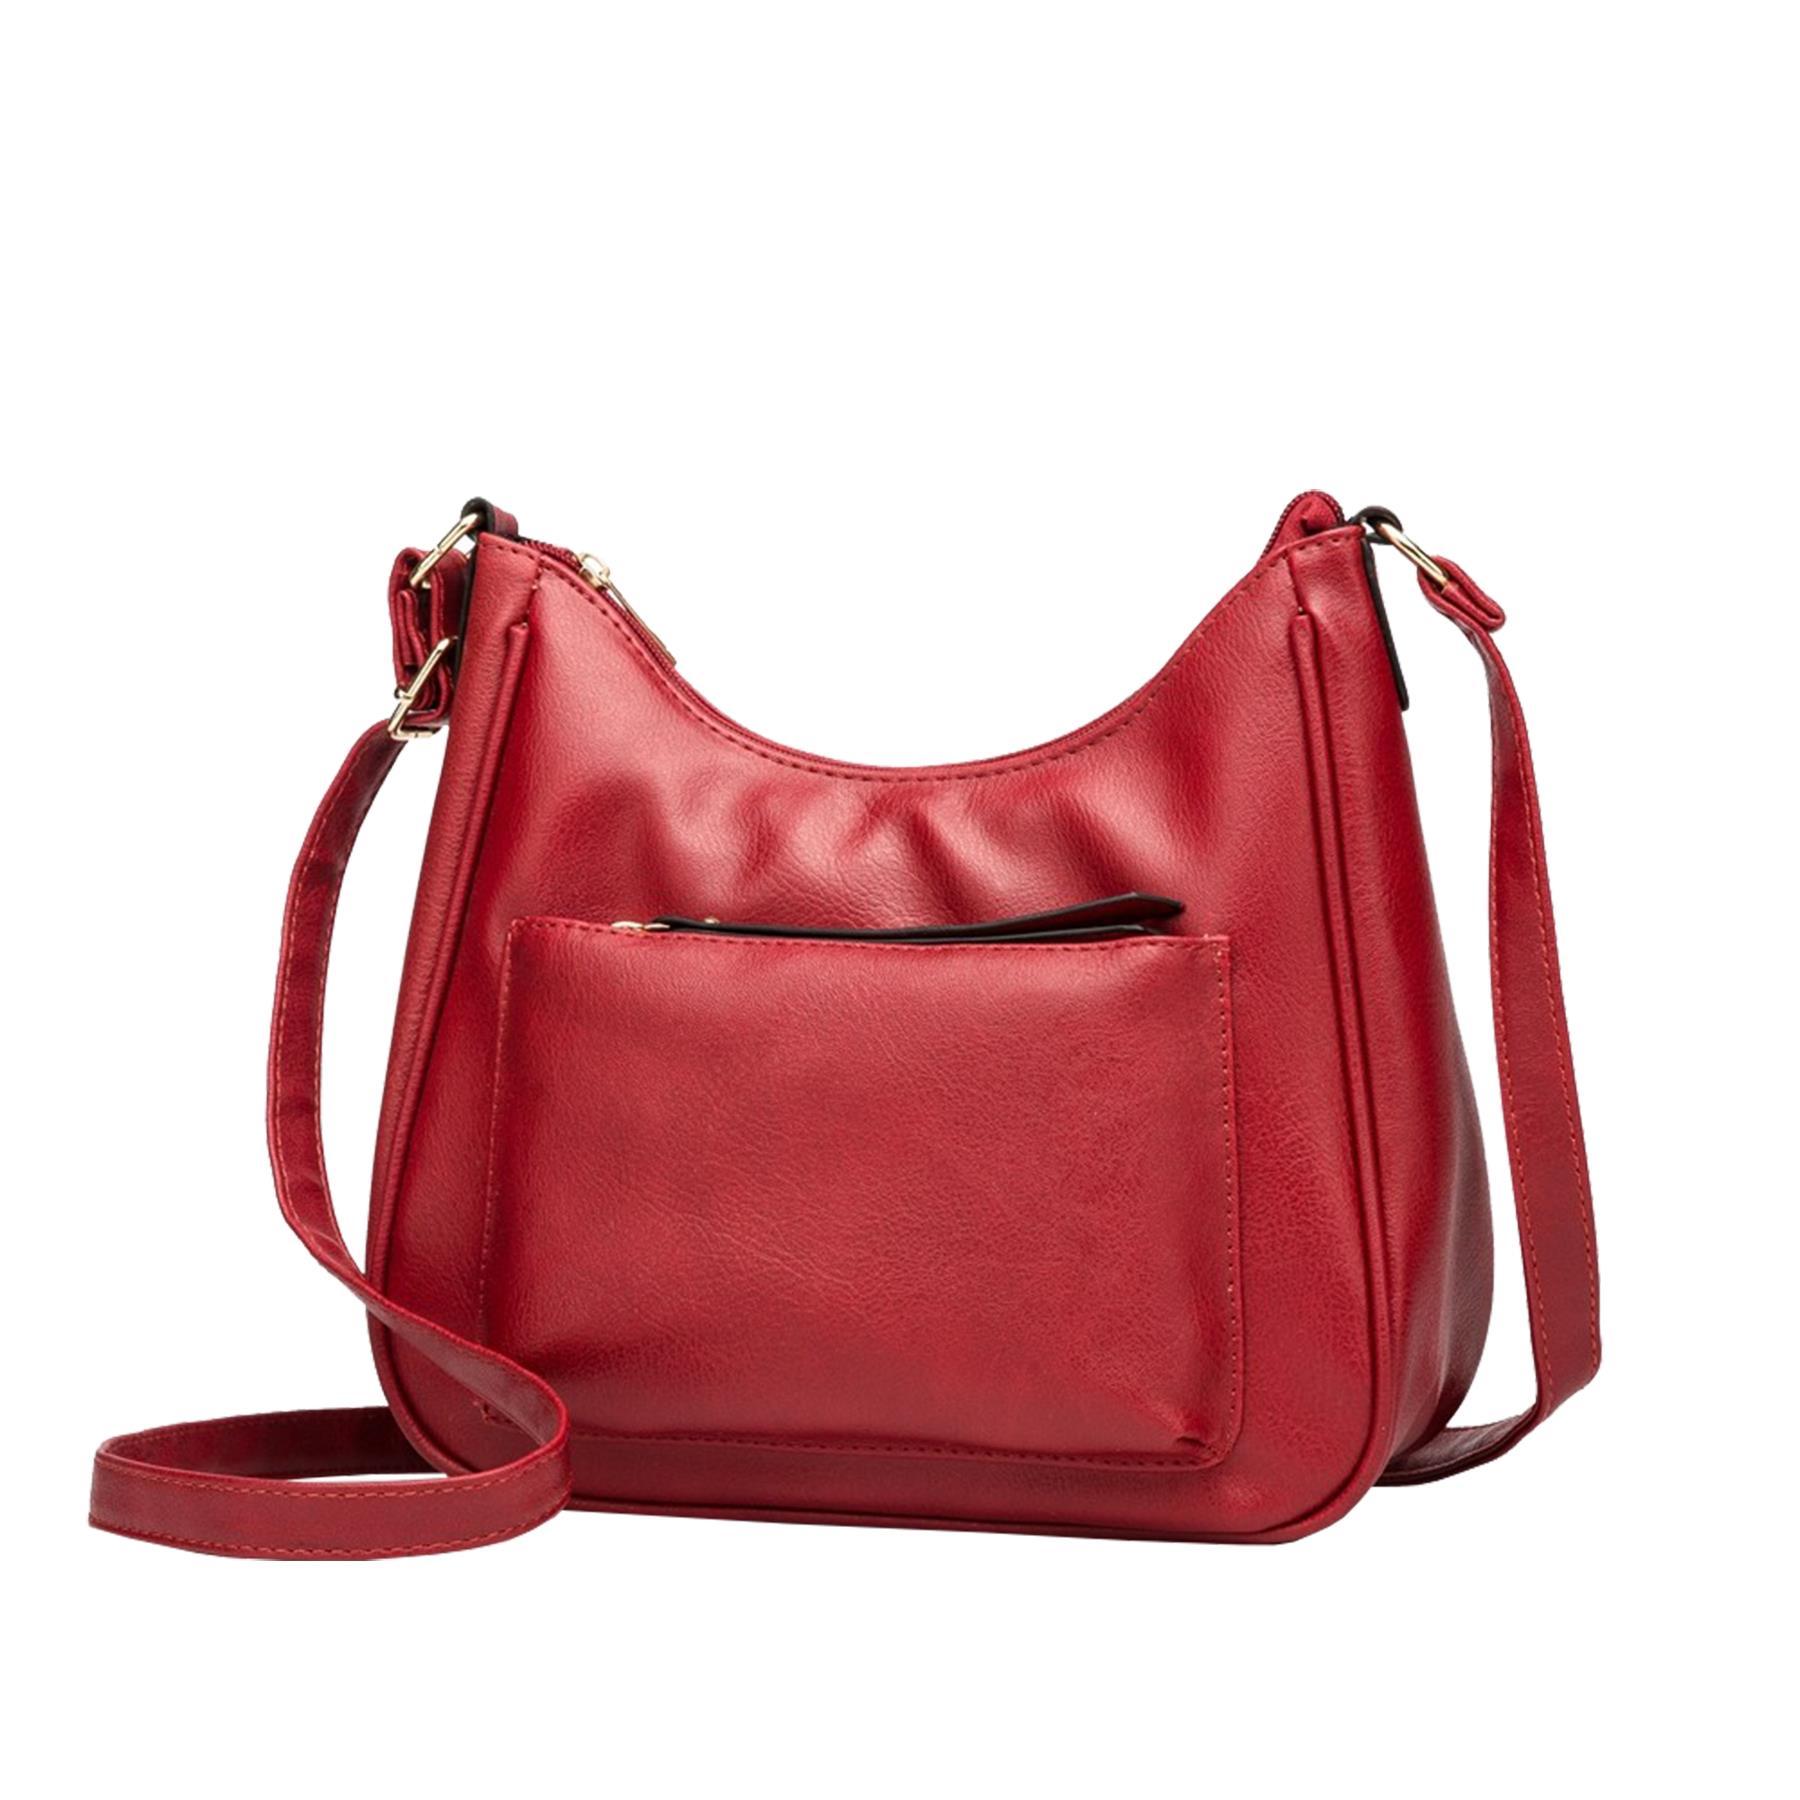 New-Soft-Synthetic-Leather-Front-Pocket-Ladies-Casual-Crossbody-Bag-Handbag thumbnail 3